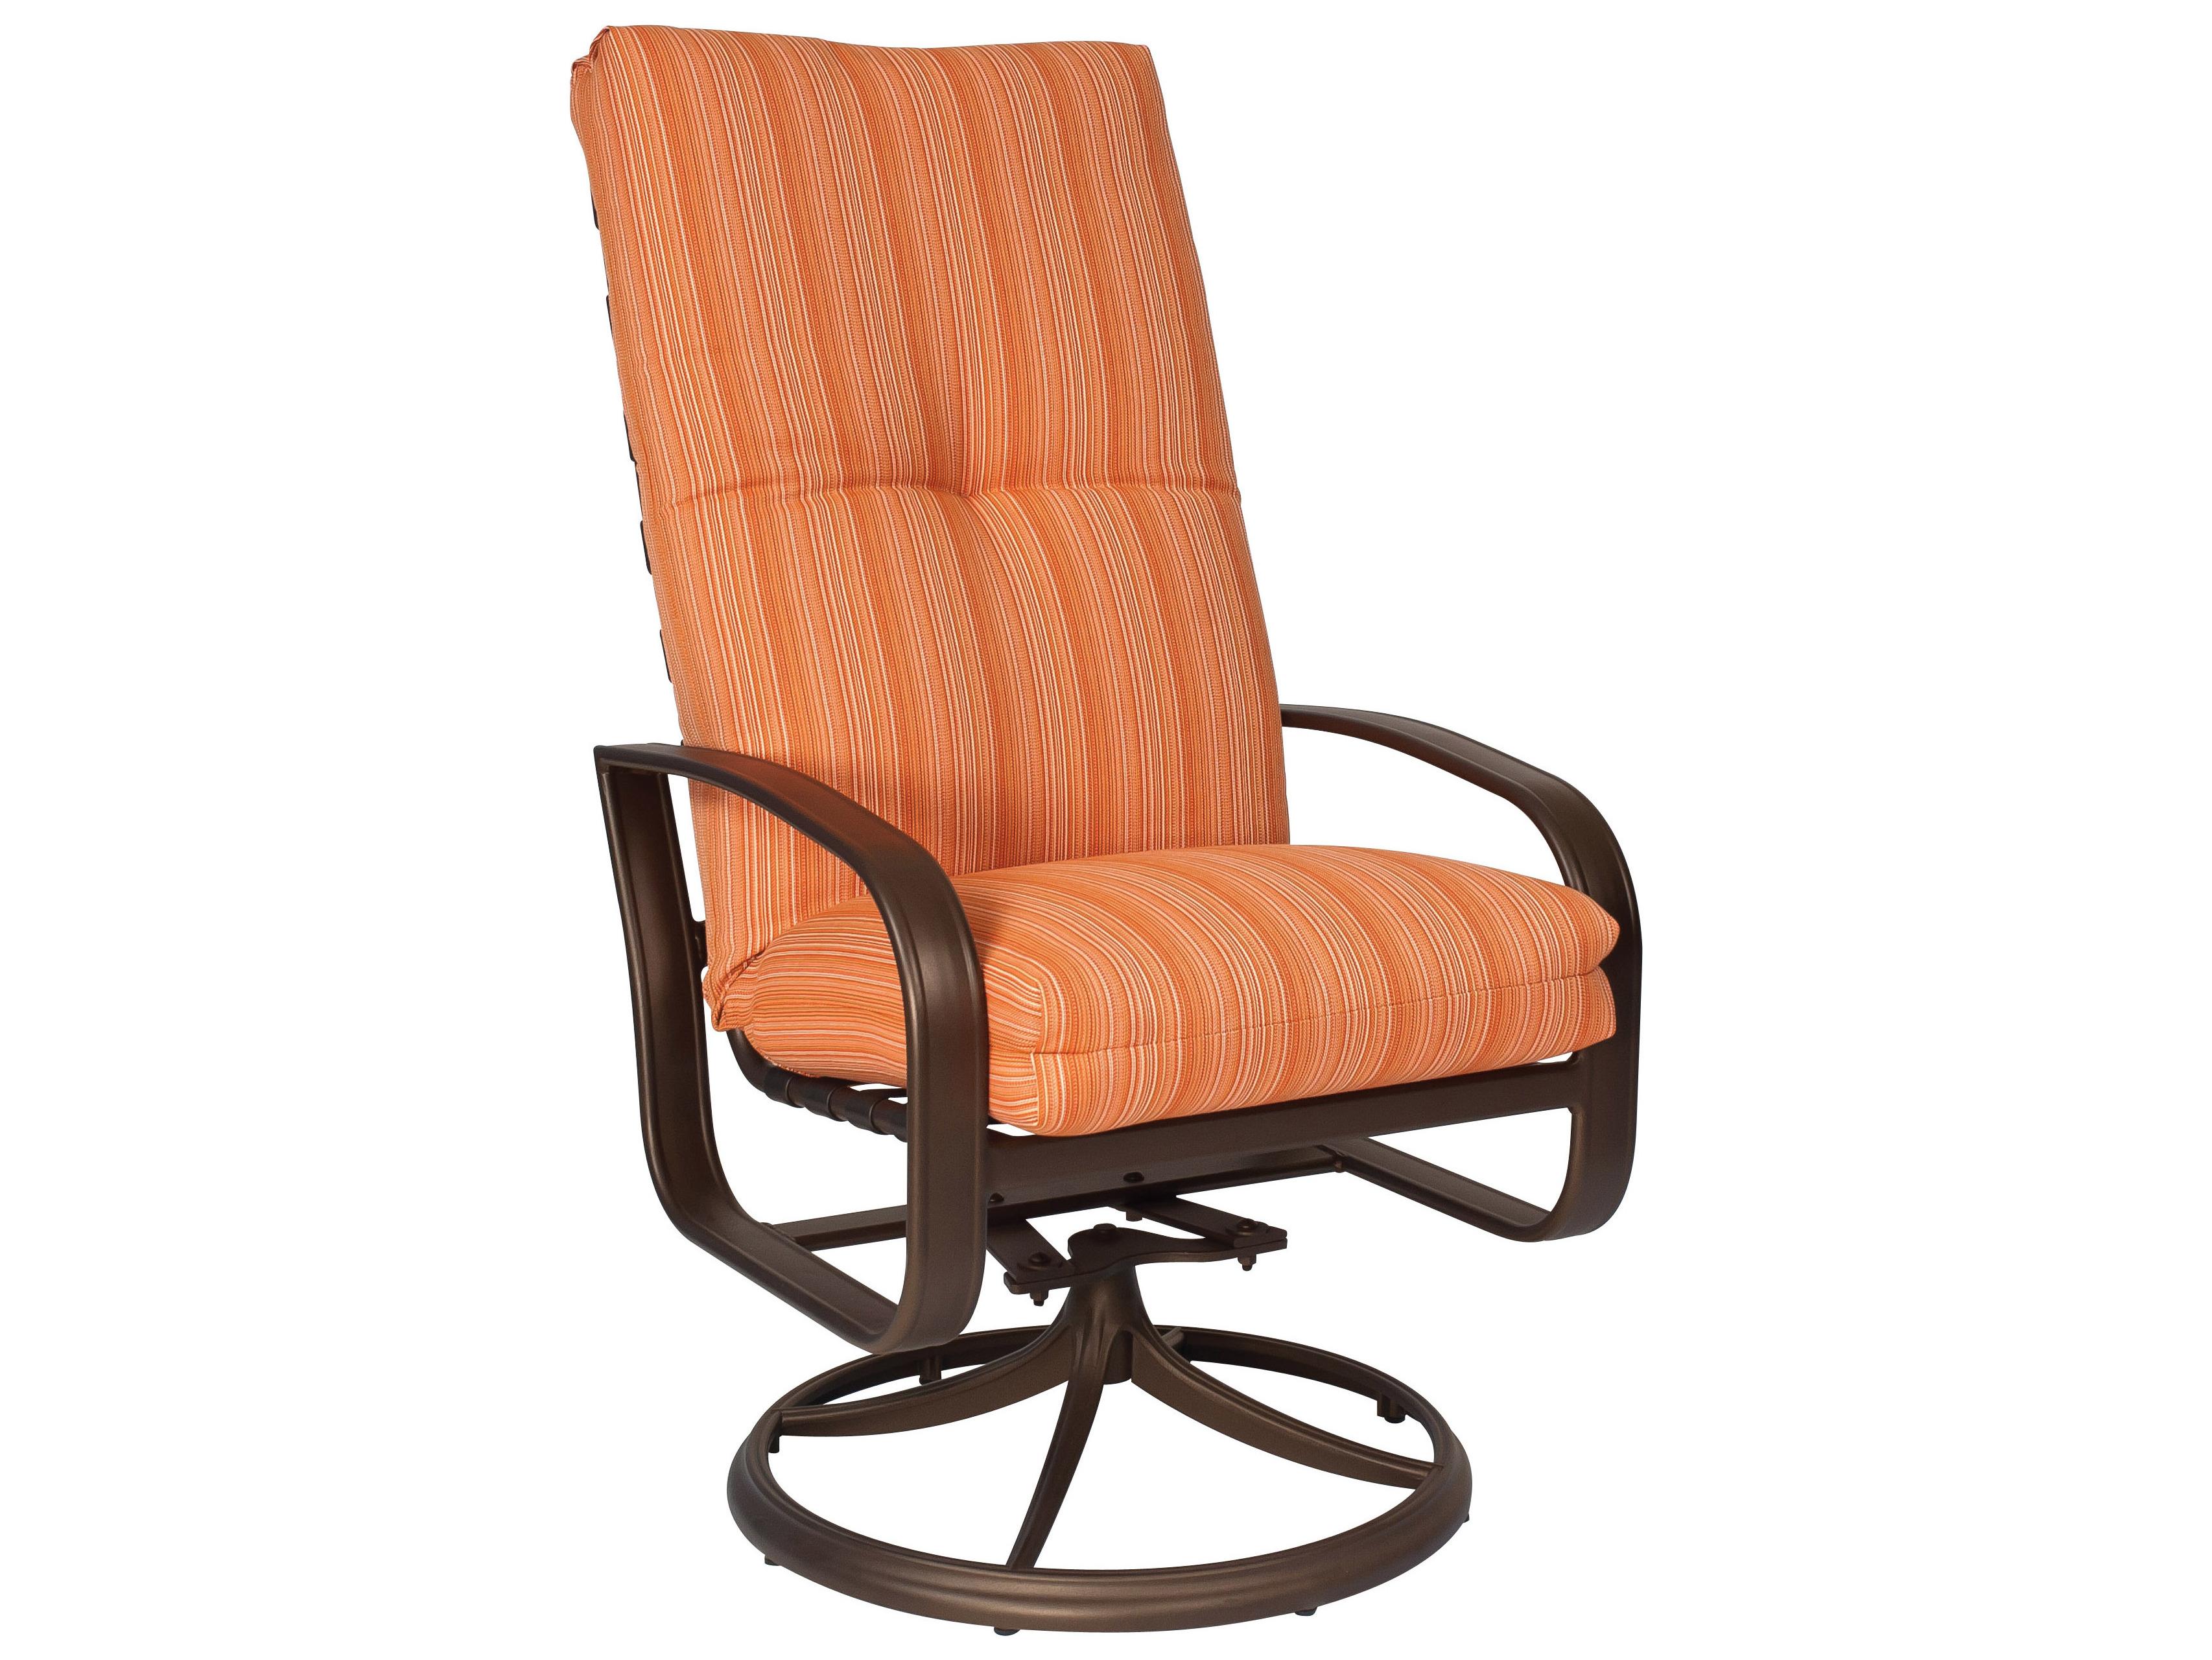 spotlight outdoor chair covers evac hire woodard cayman isle cushion aluminum high back swivel